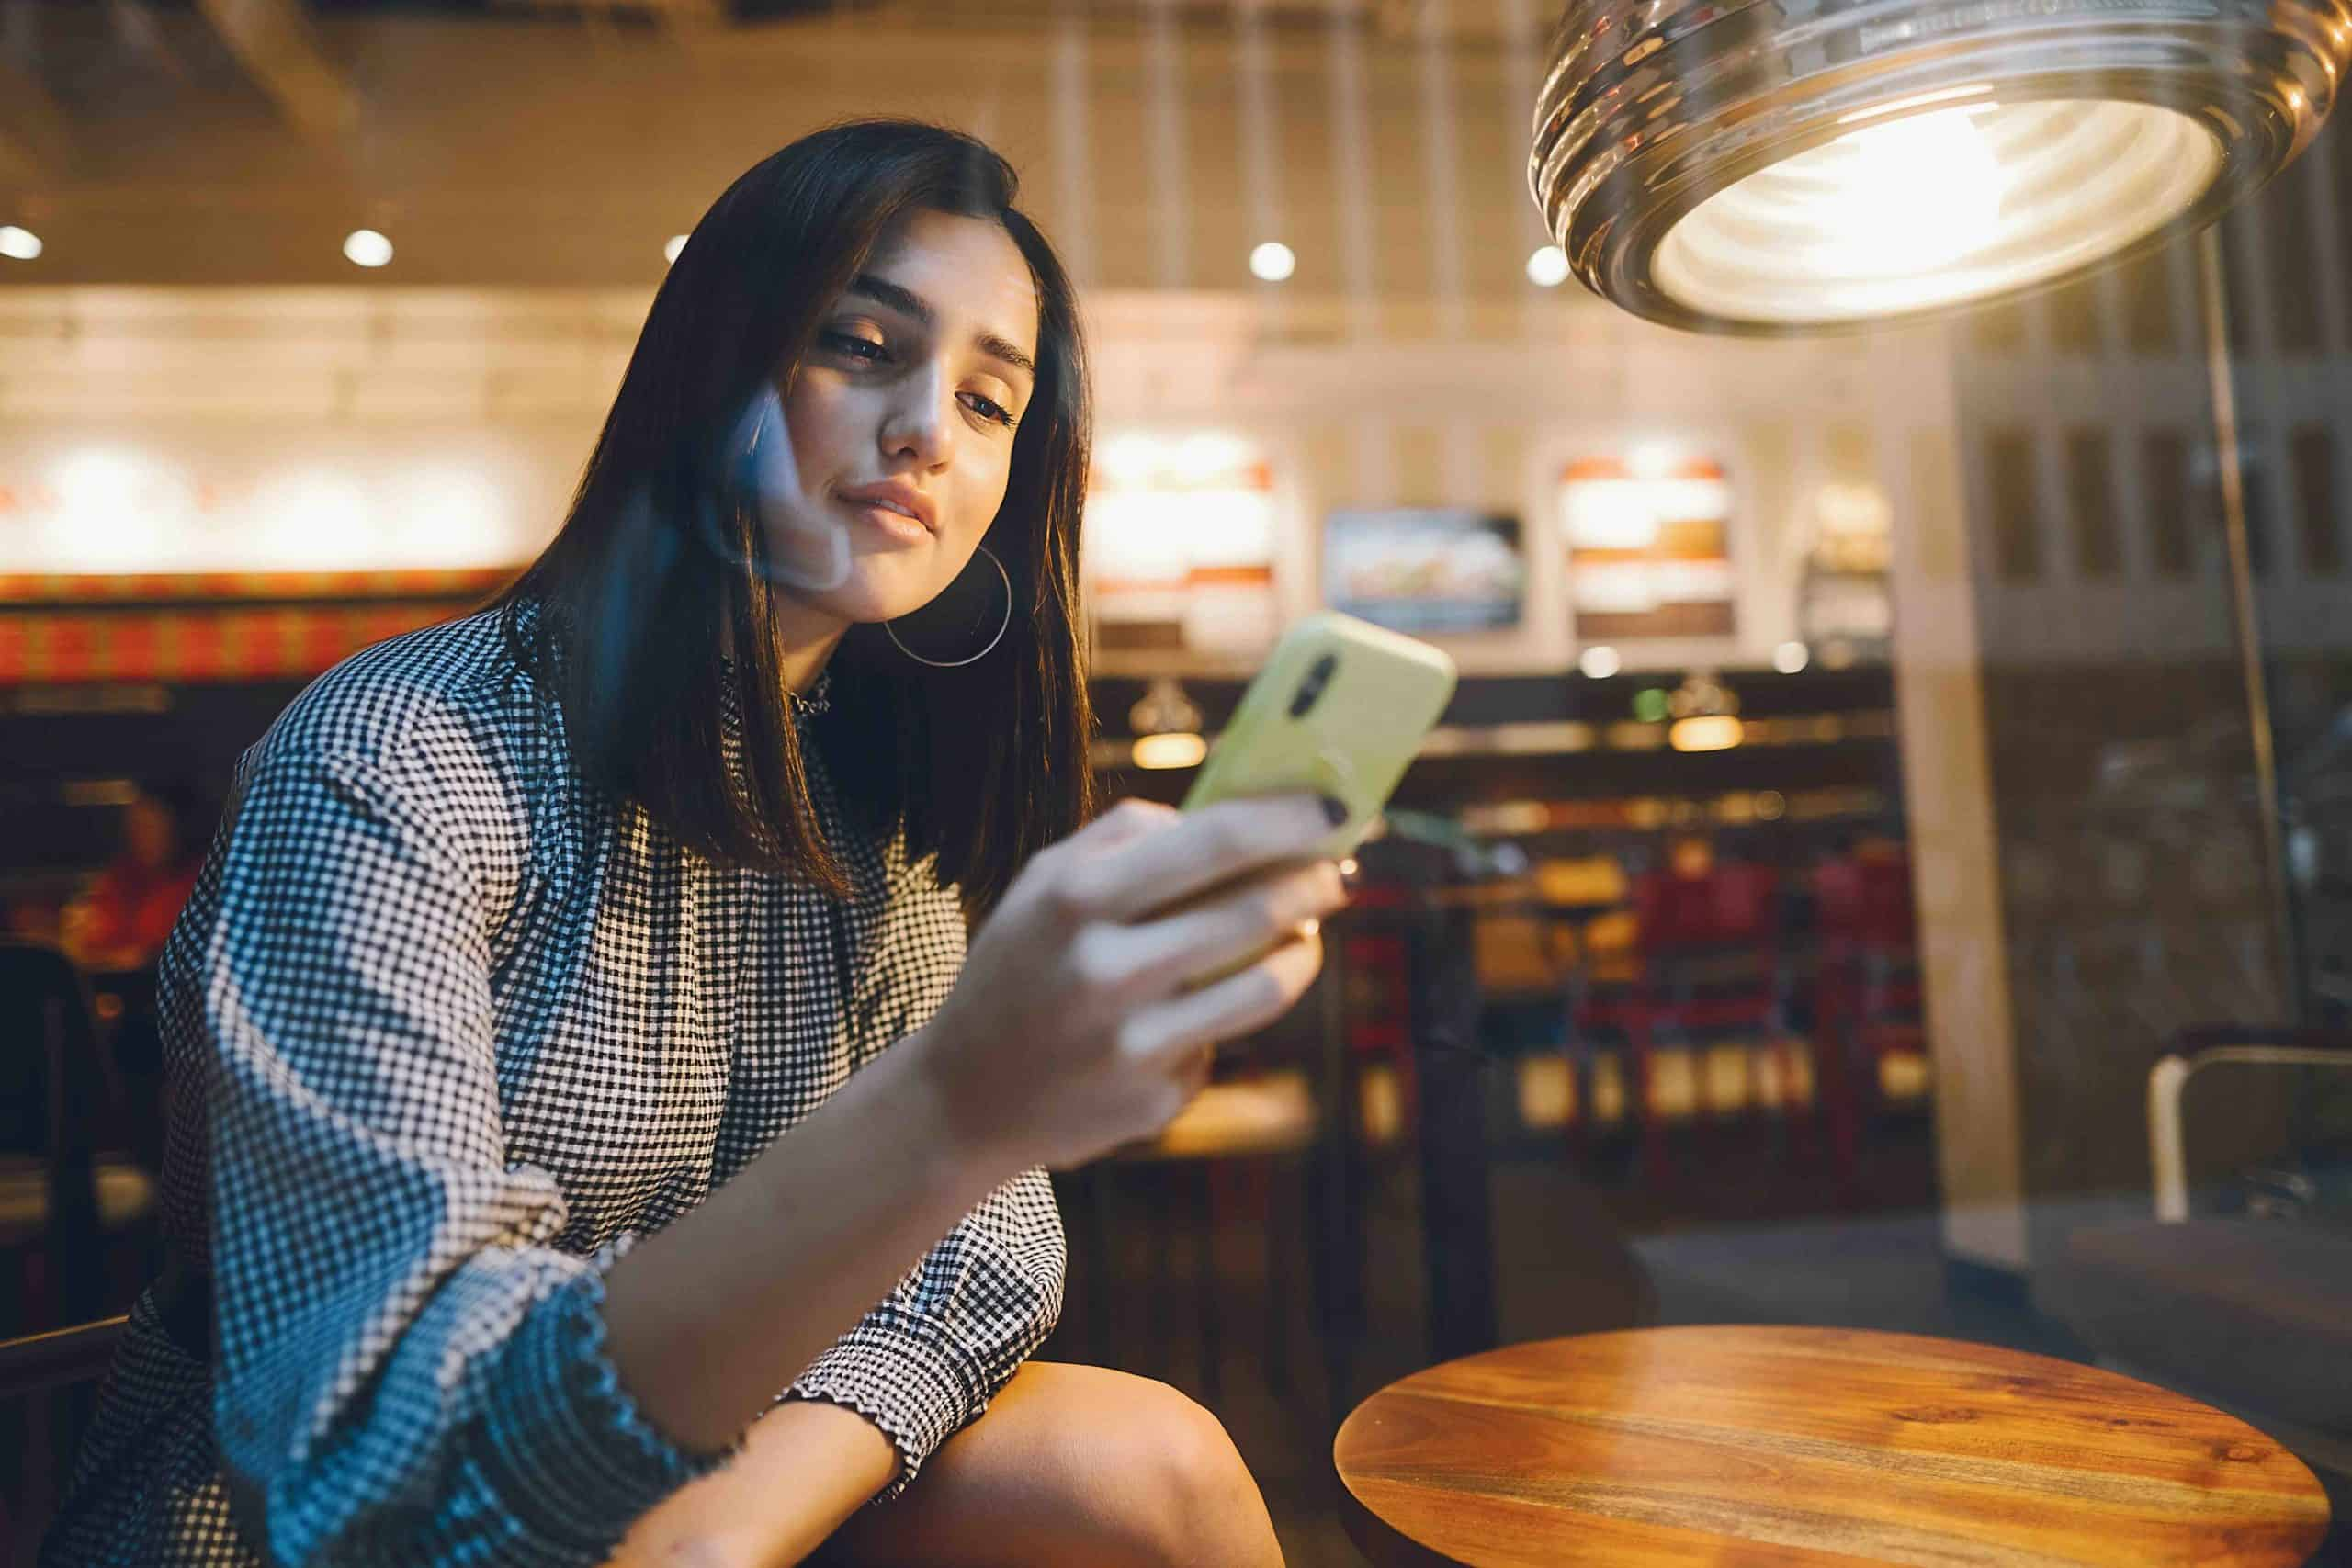 brunette girl using her cellphone to reach a friend